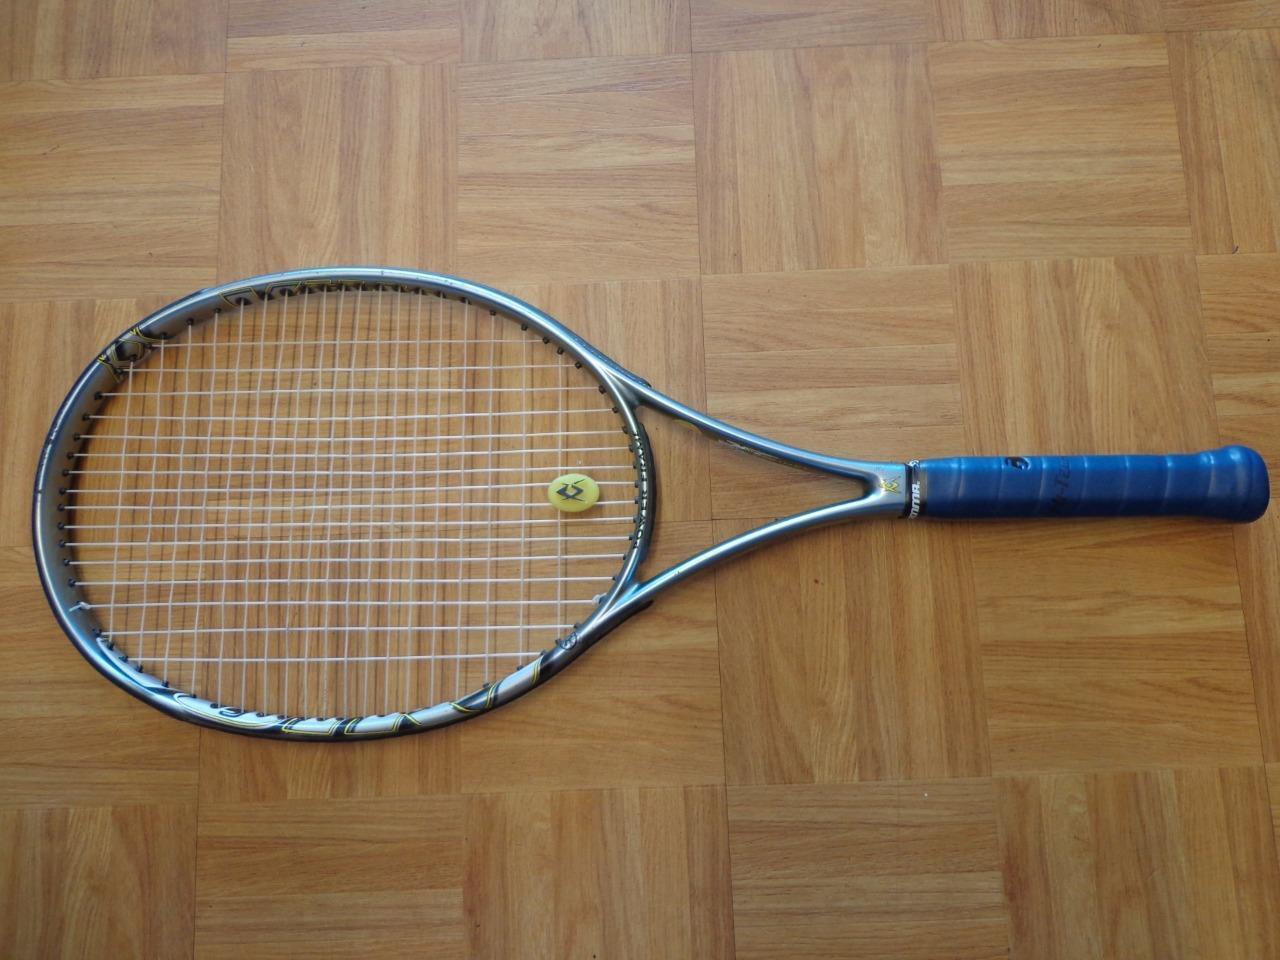 Volkl Xtended 2 Oversize 112 head 4 3/8 grip Tennis Racquet